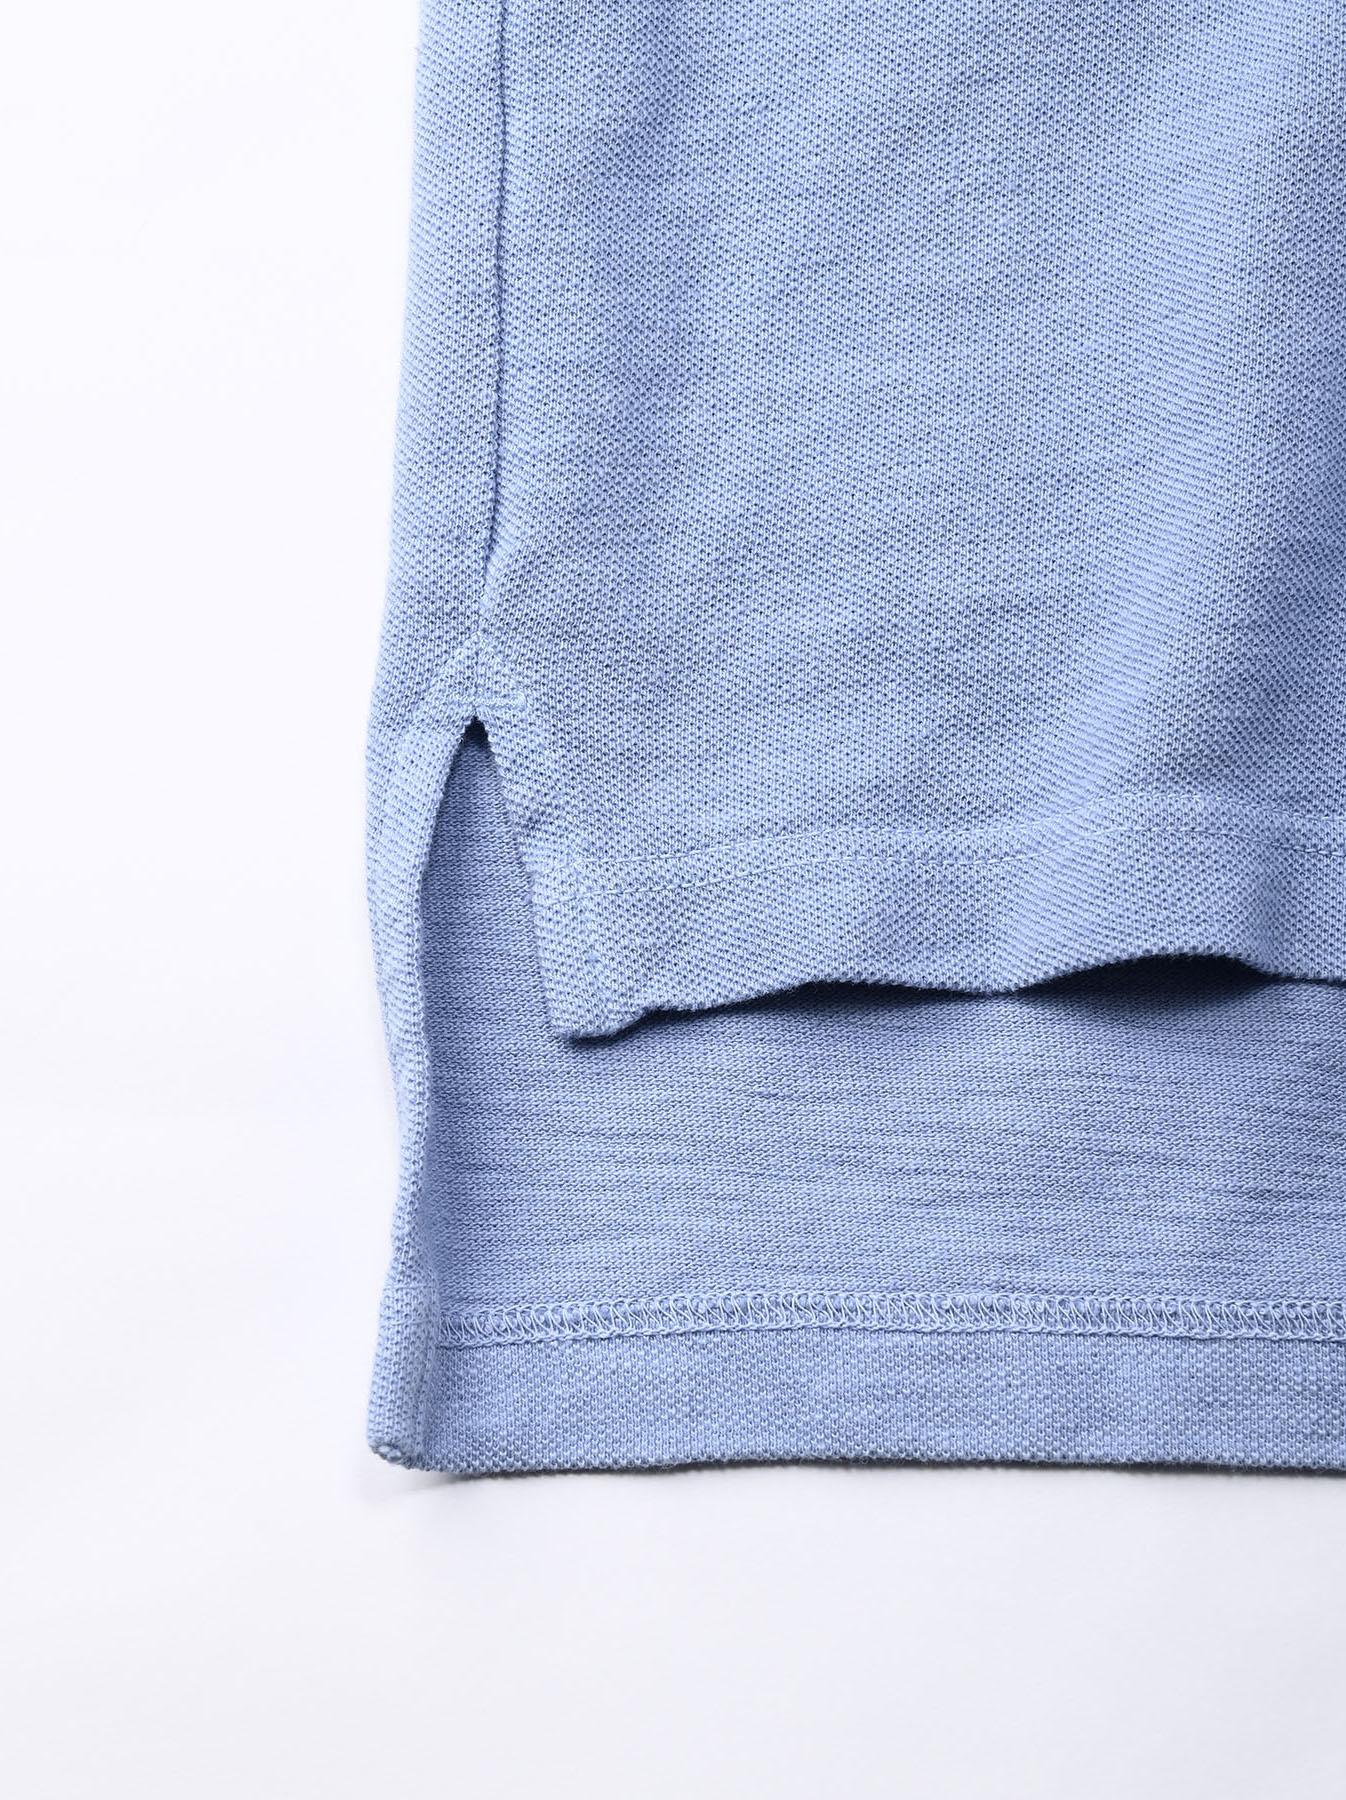 Kanoko Ocean Shiokaze Short-sleeved Polo Shirt (0521)-11